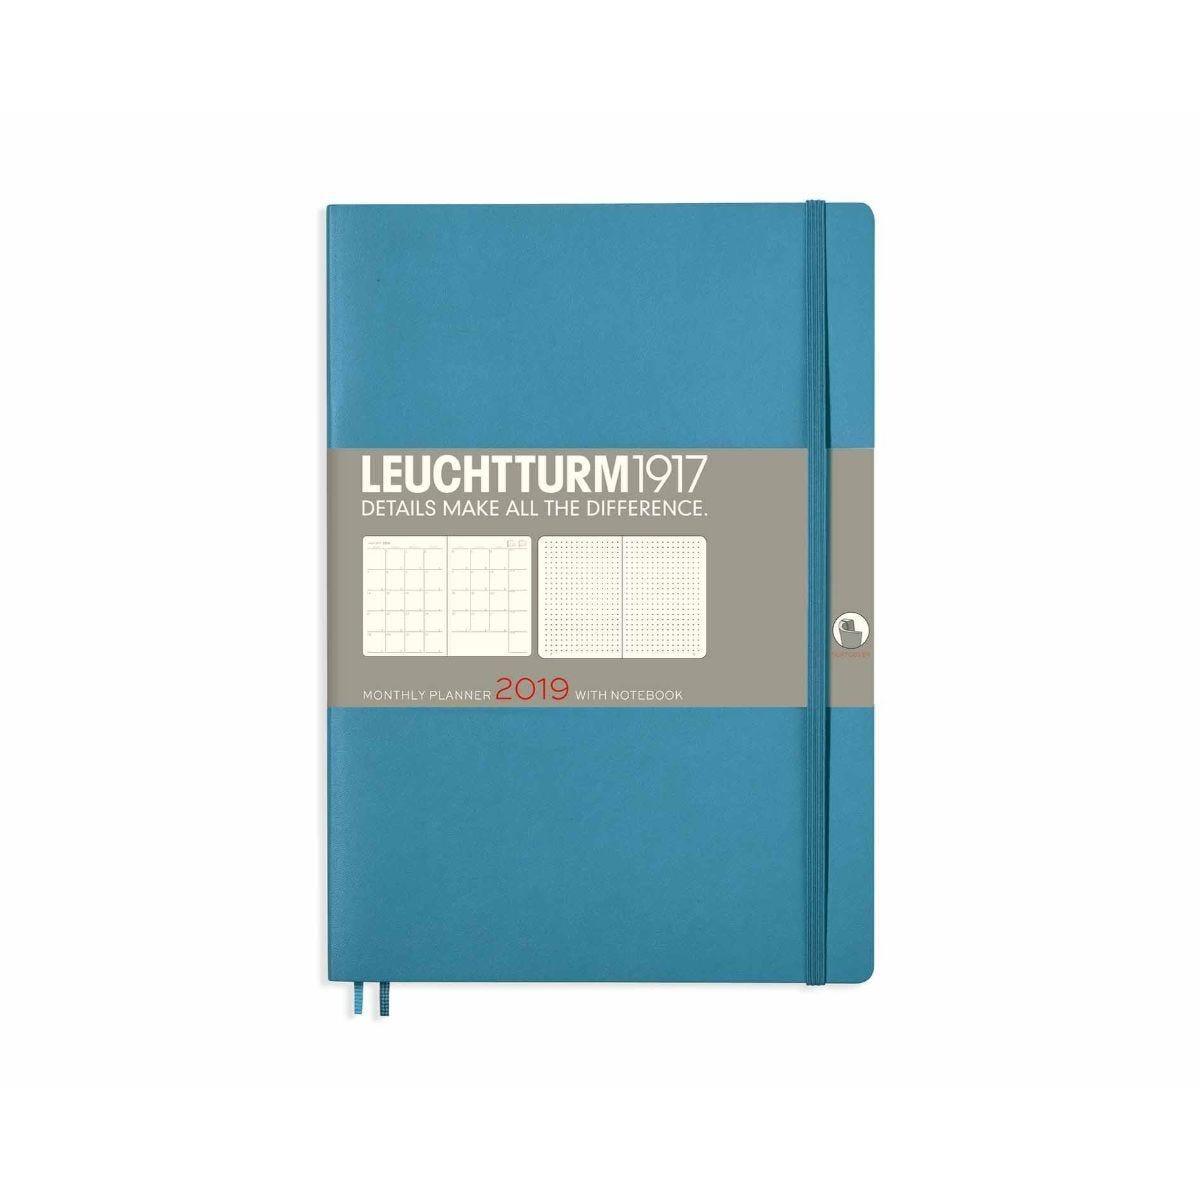 Leuchtturm Monthly Planner B5 2019 Nordic Blue